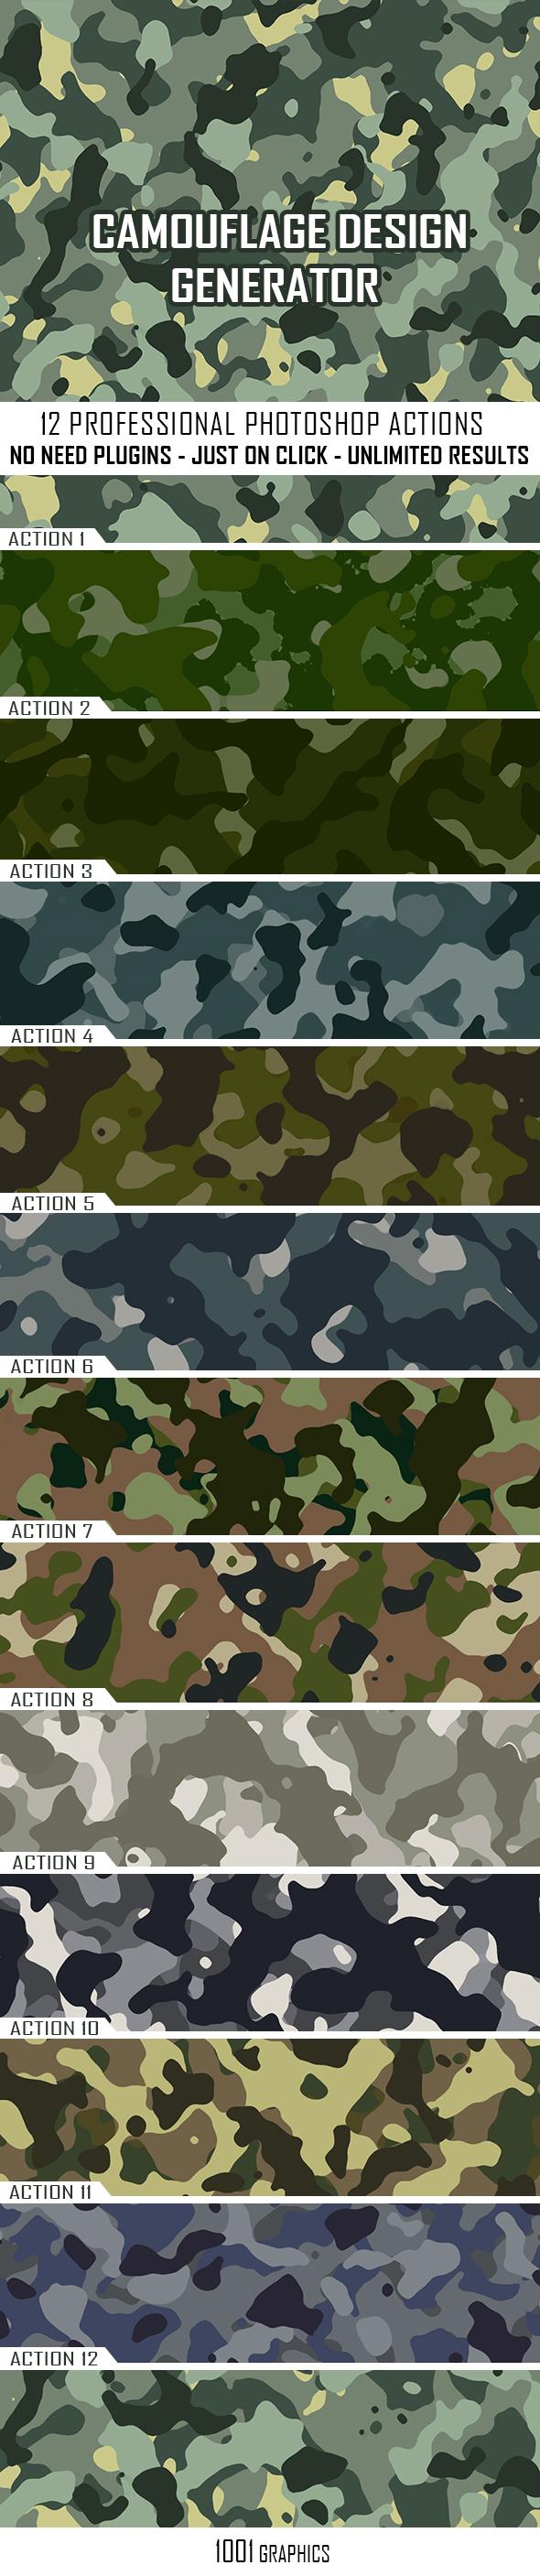 Camouflage Texture Generator - 12 PS Actions  Vol.1 - Utilities Actions